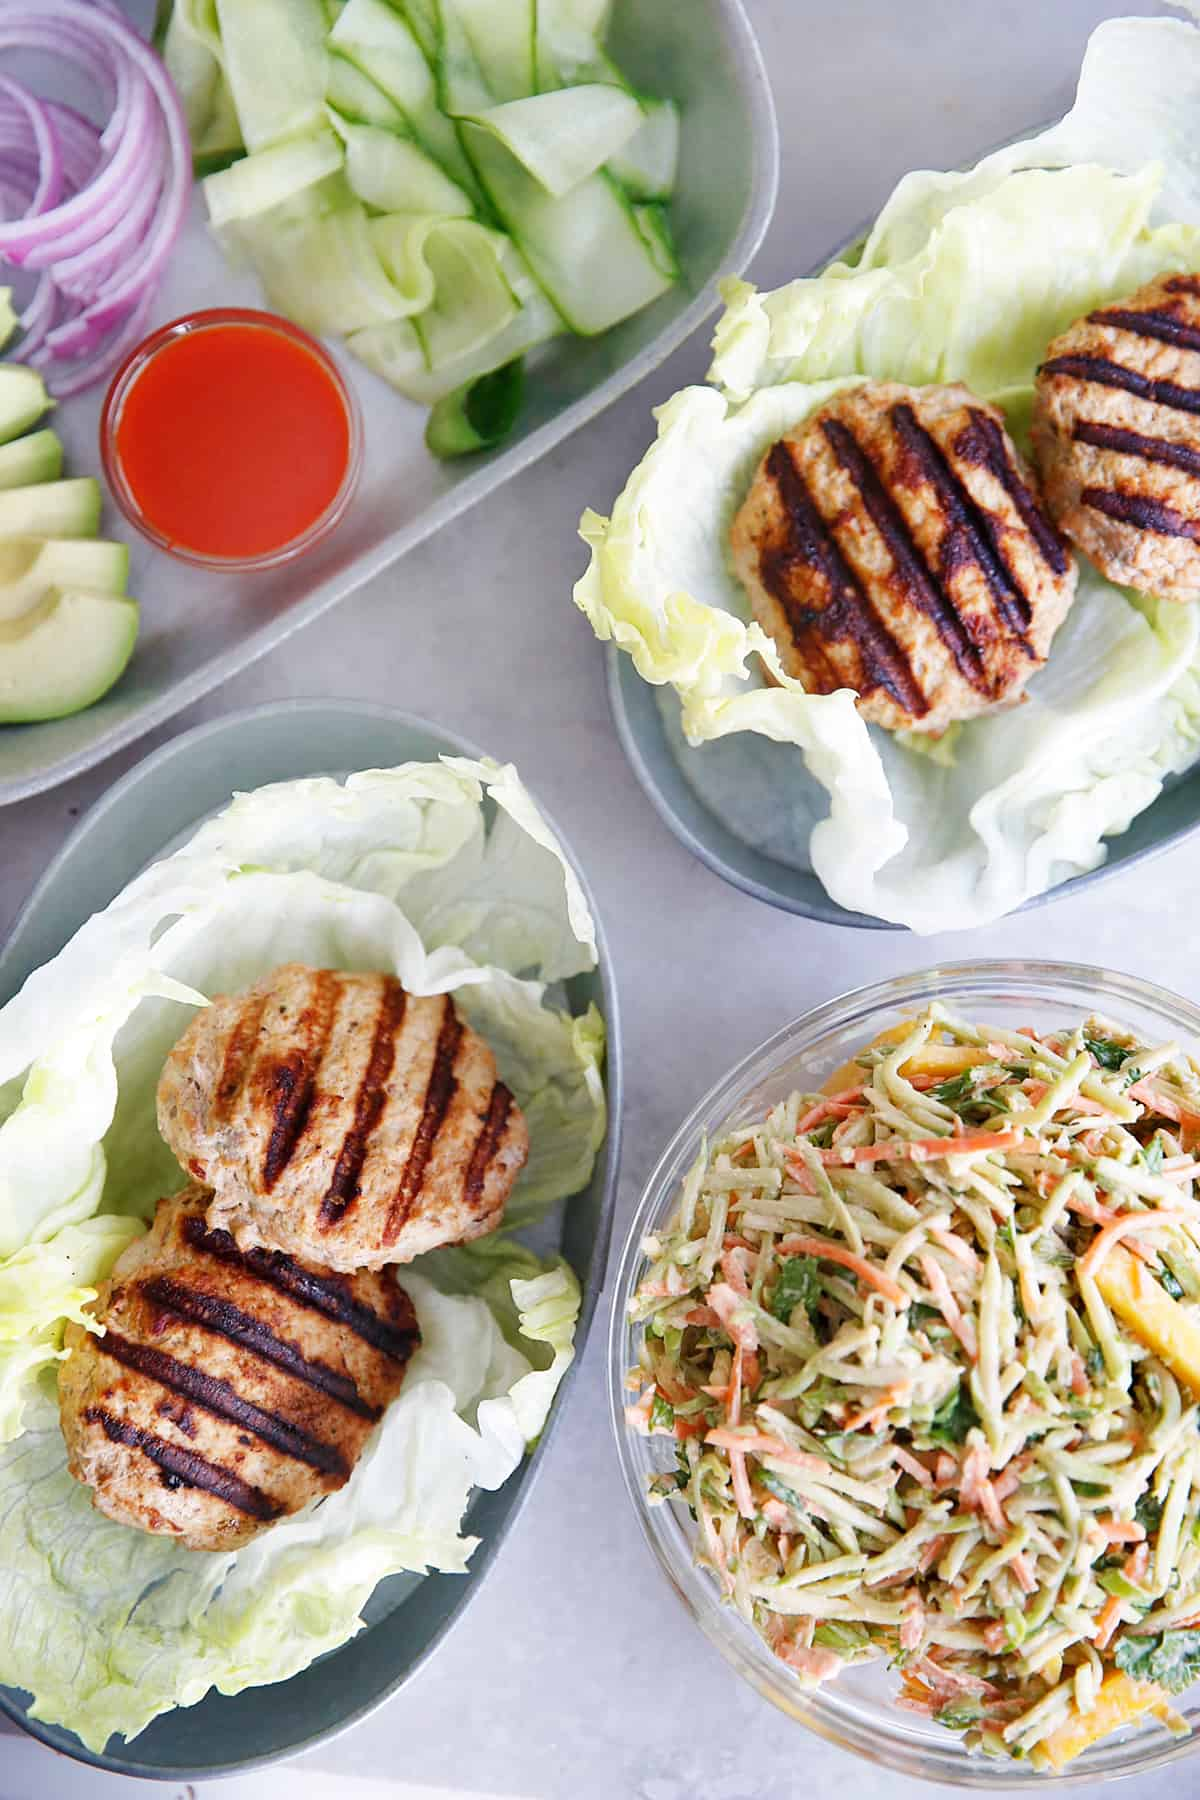 Thai Turkey Burgers and Slaw